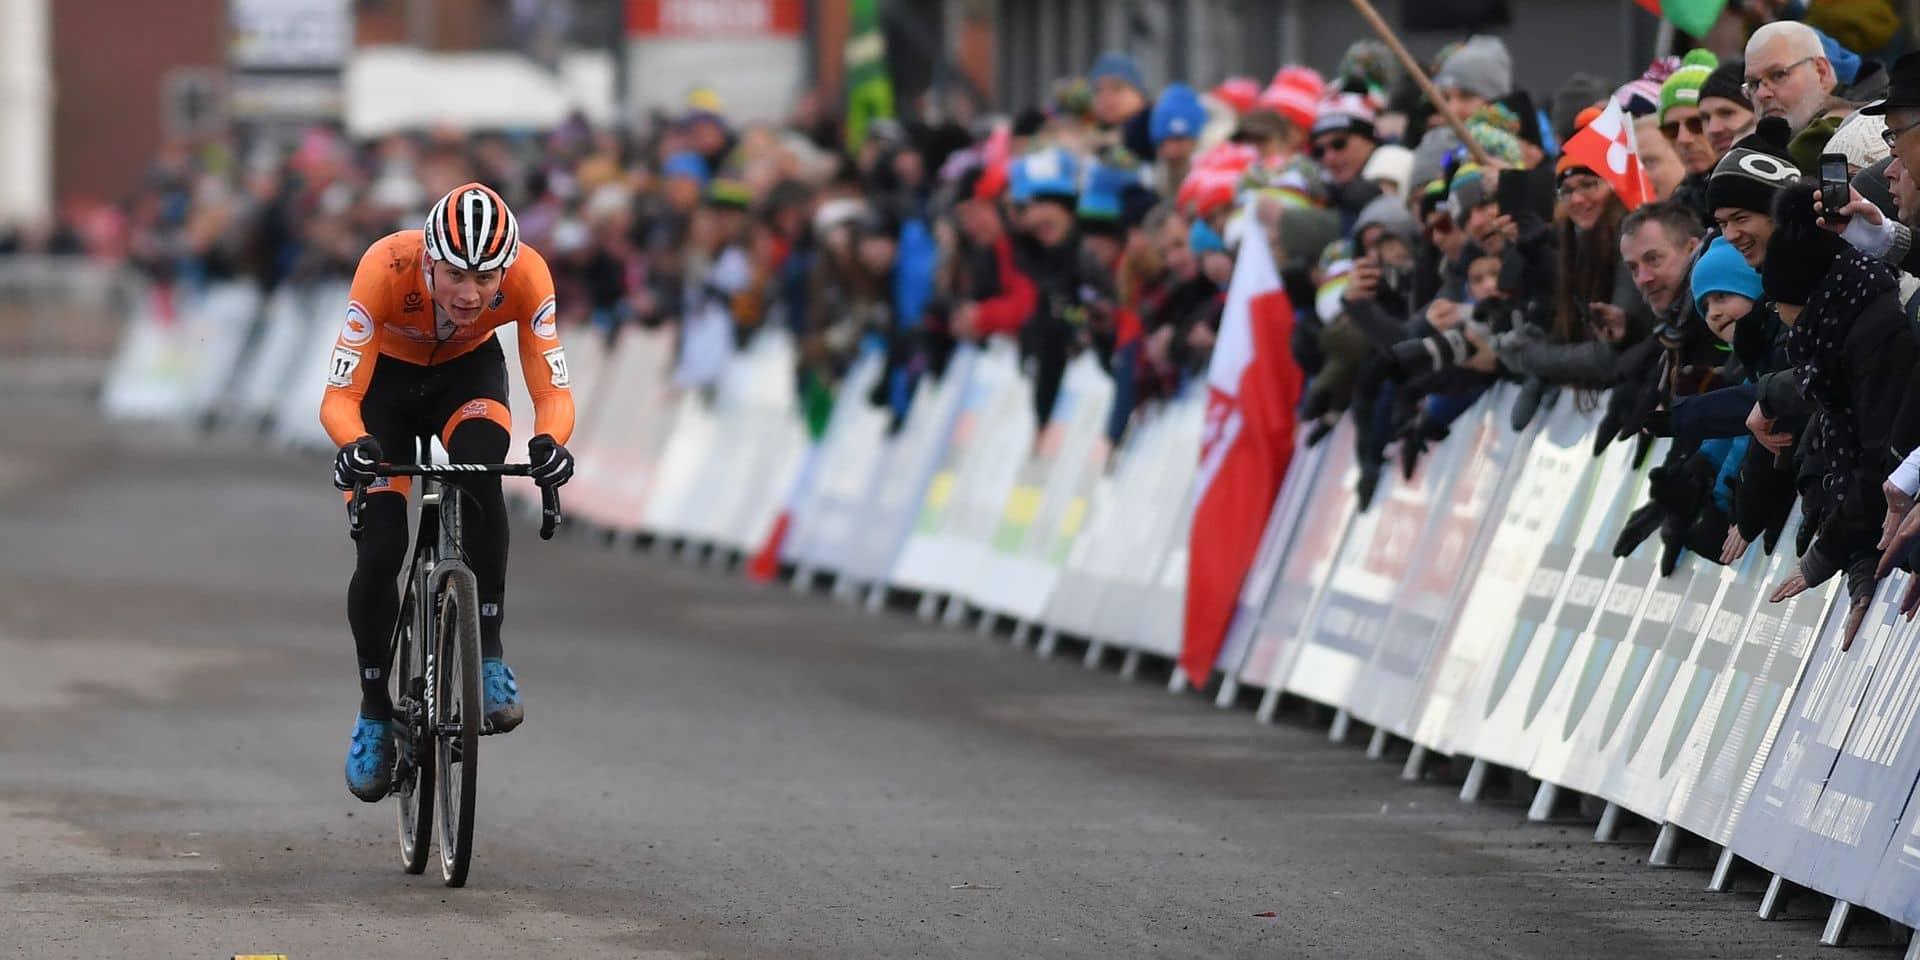 Mathieu Van der Poel est champion du monde de cyclo-cross